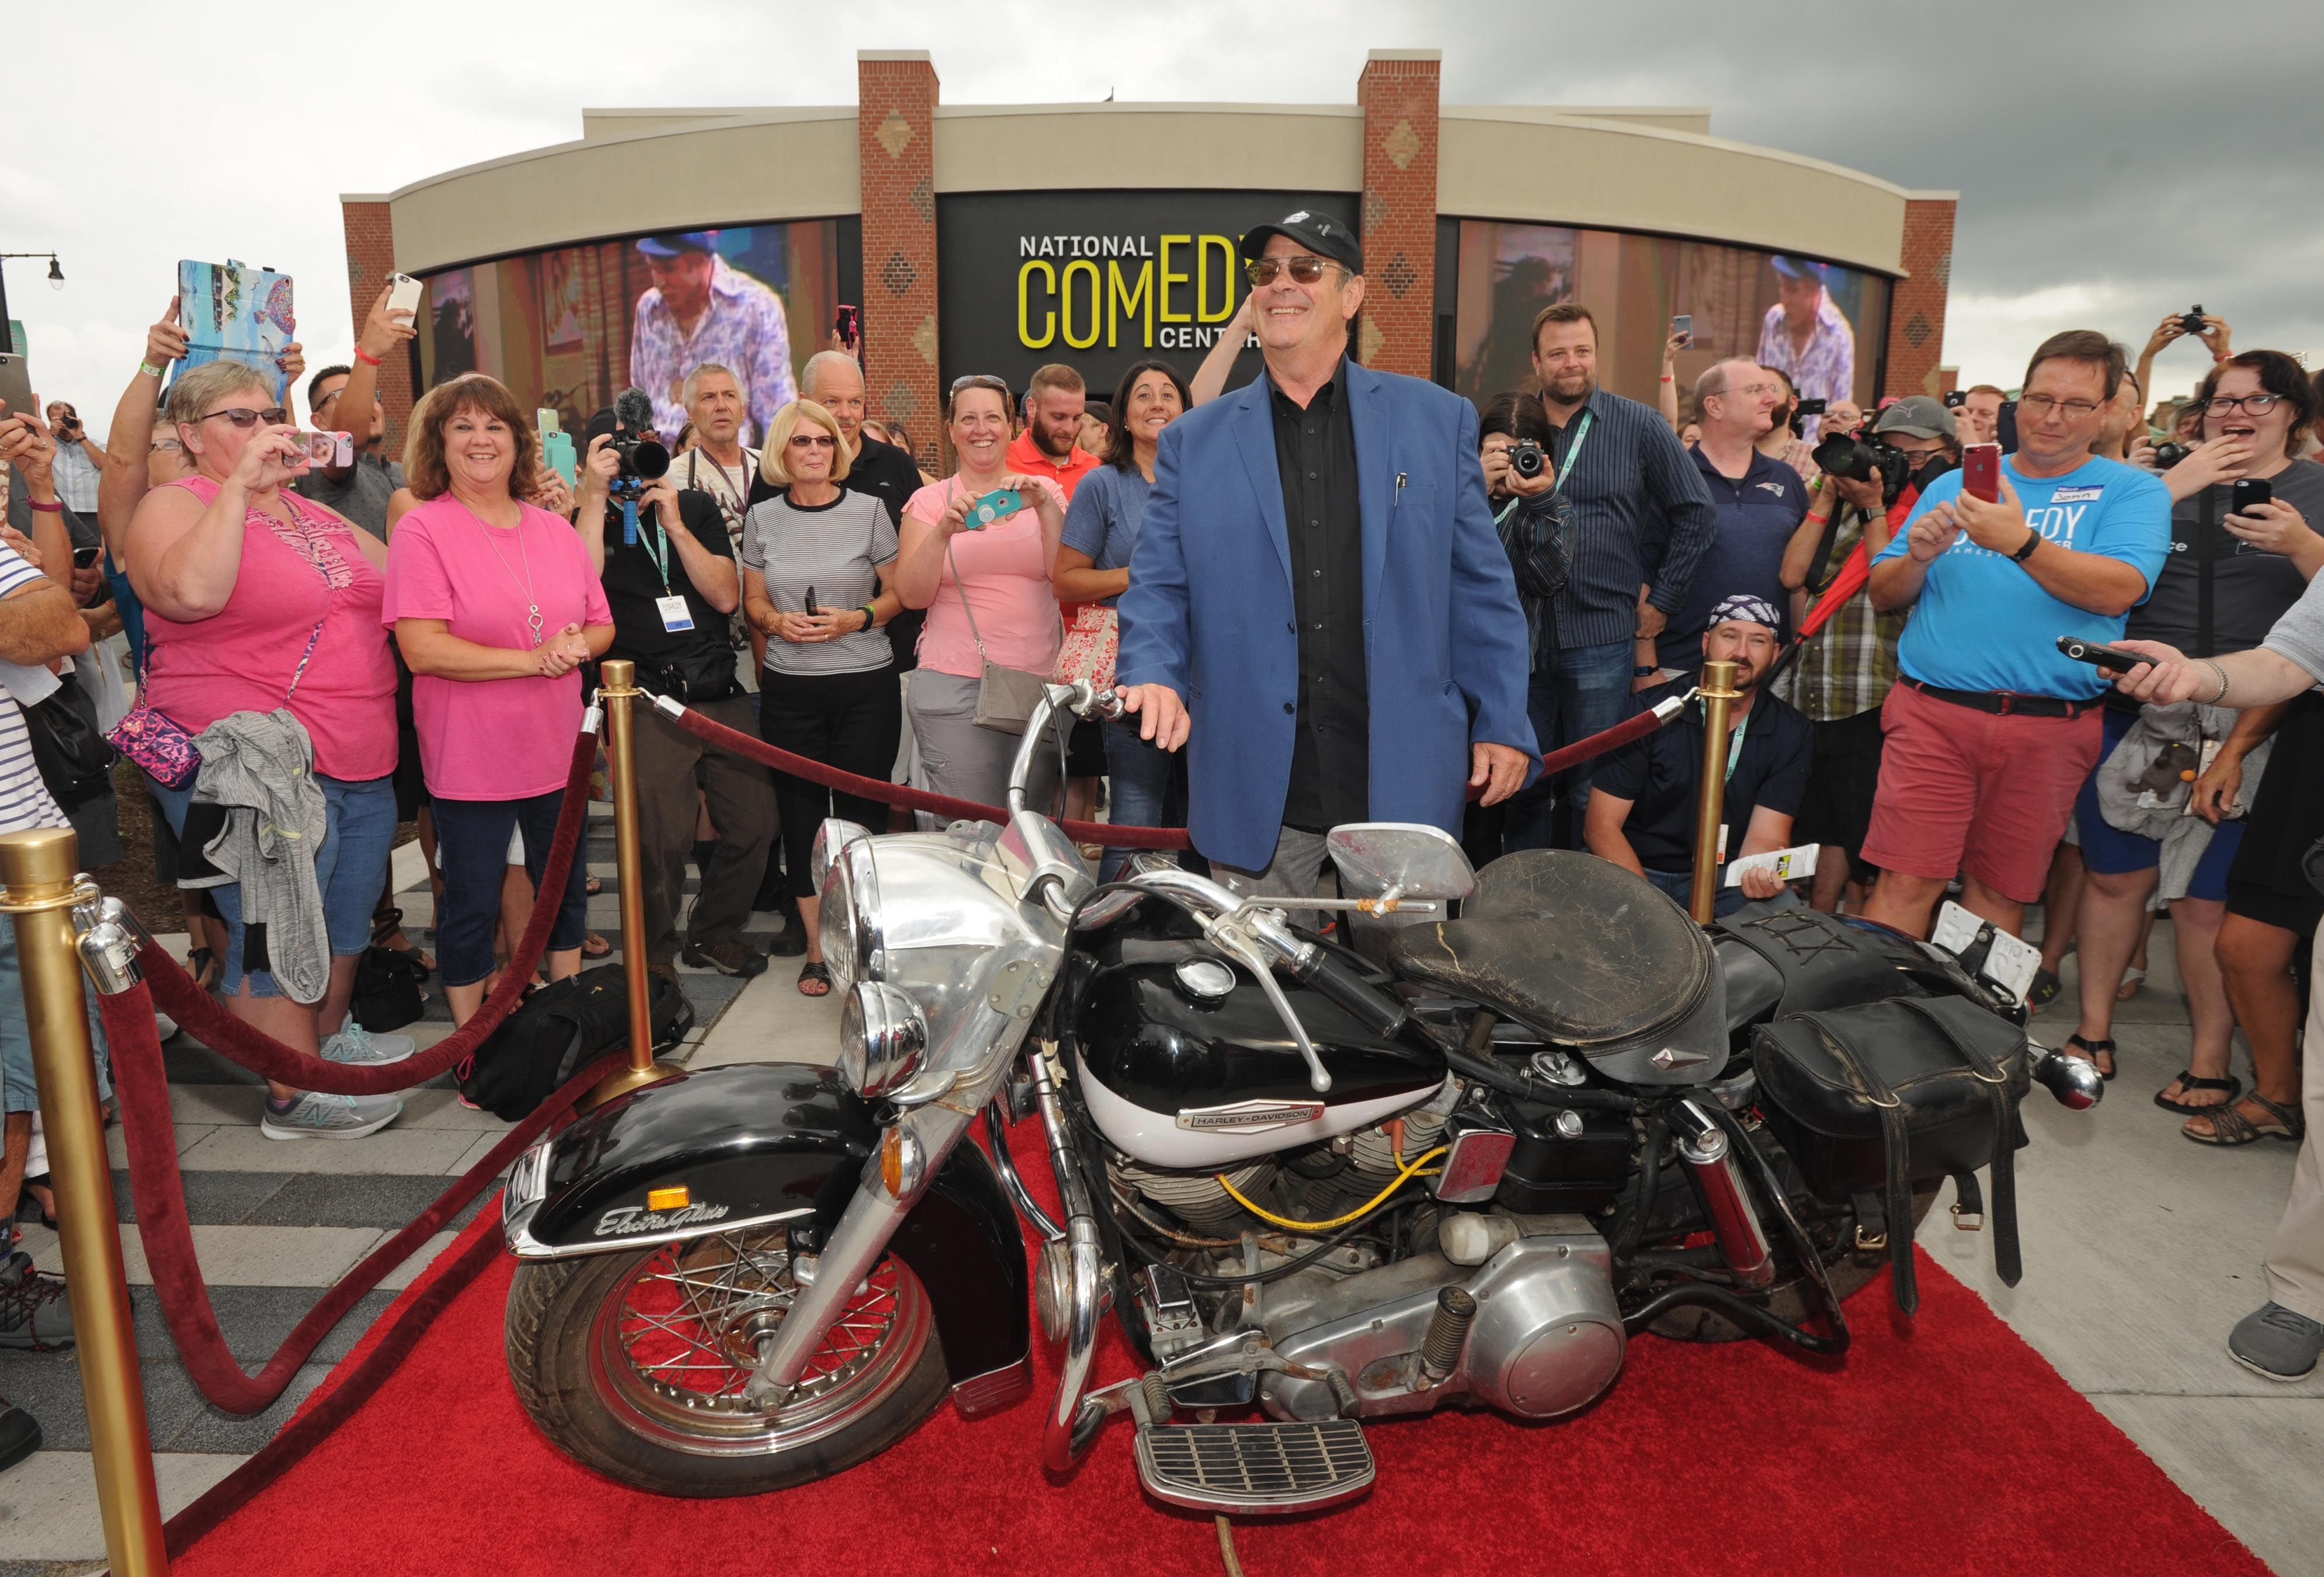 Dan_Aykroyd_Donates_Motorcycle